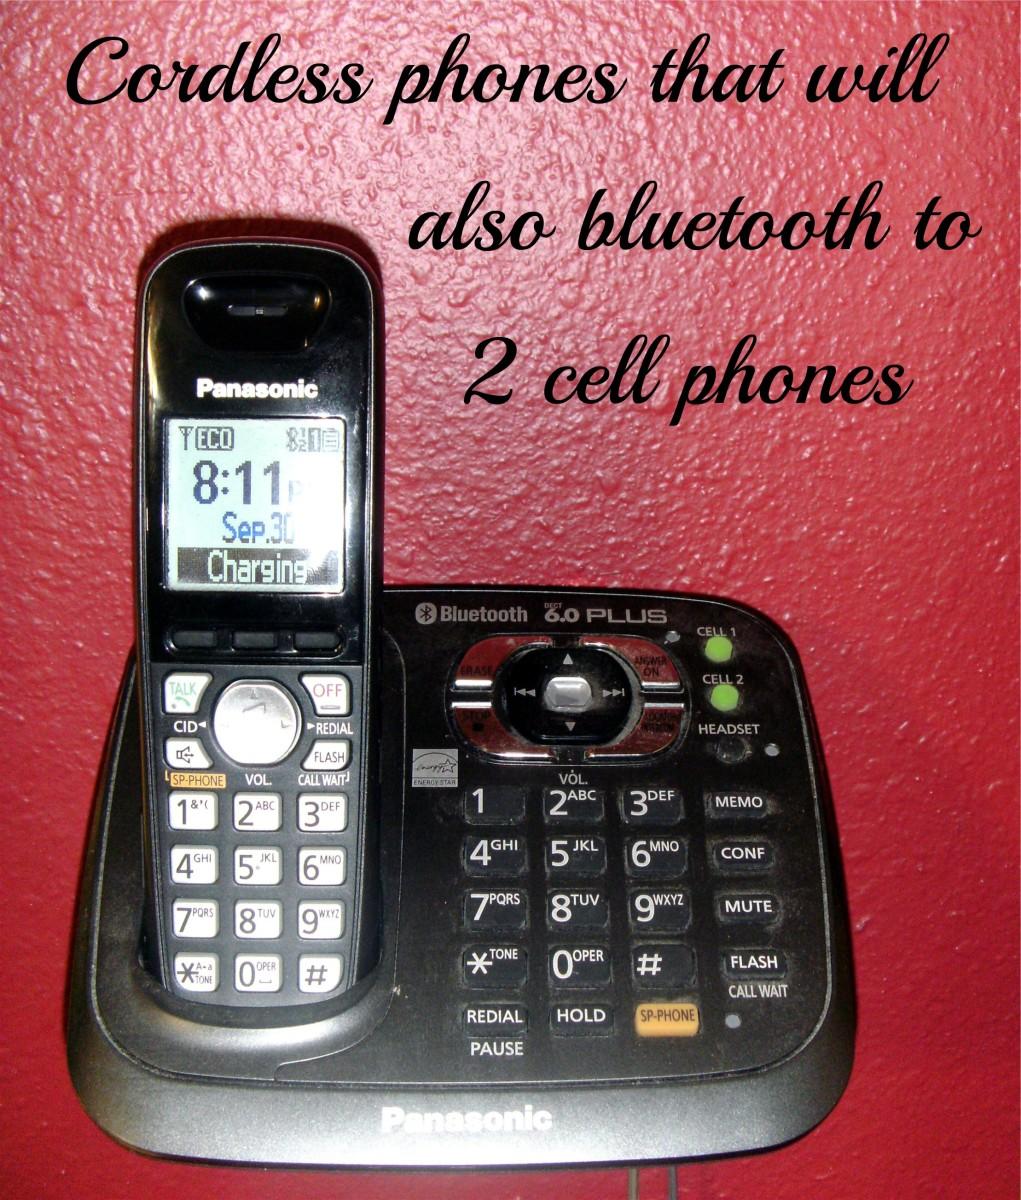 A Cordless Bluetooth Home Phone Review- Panasonic Kx-TG Phones